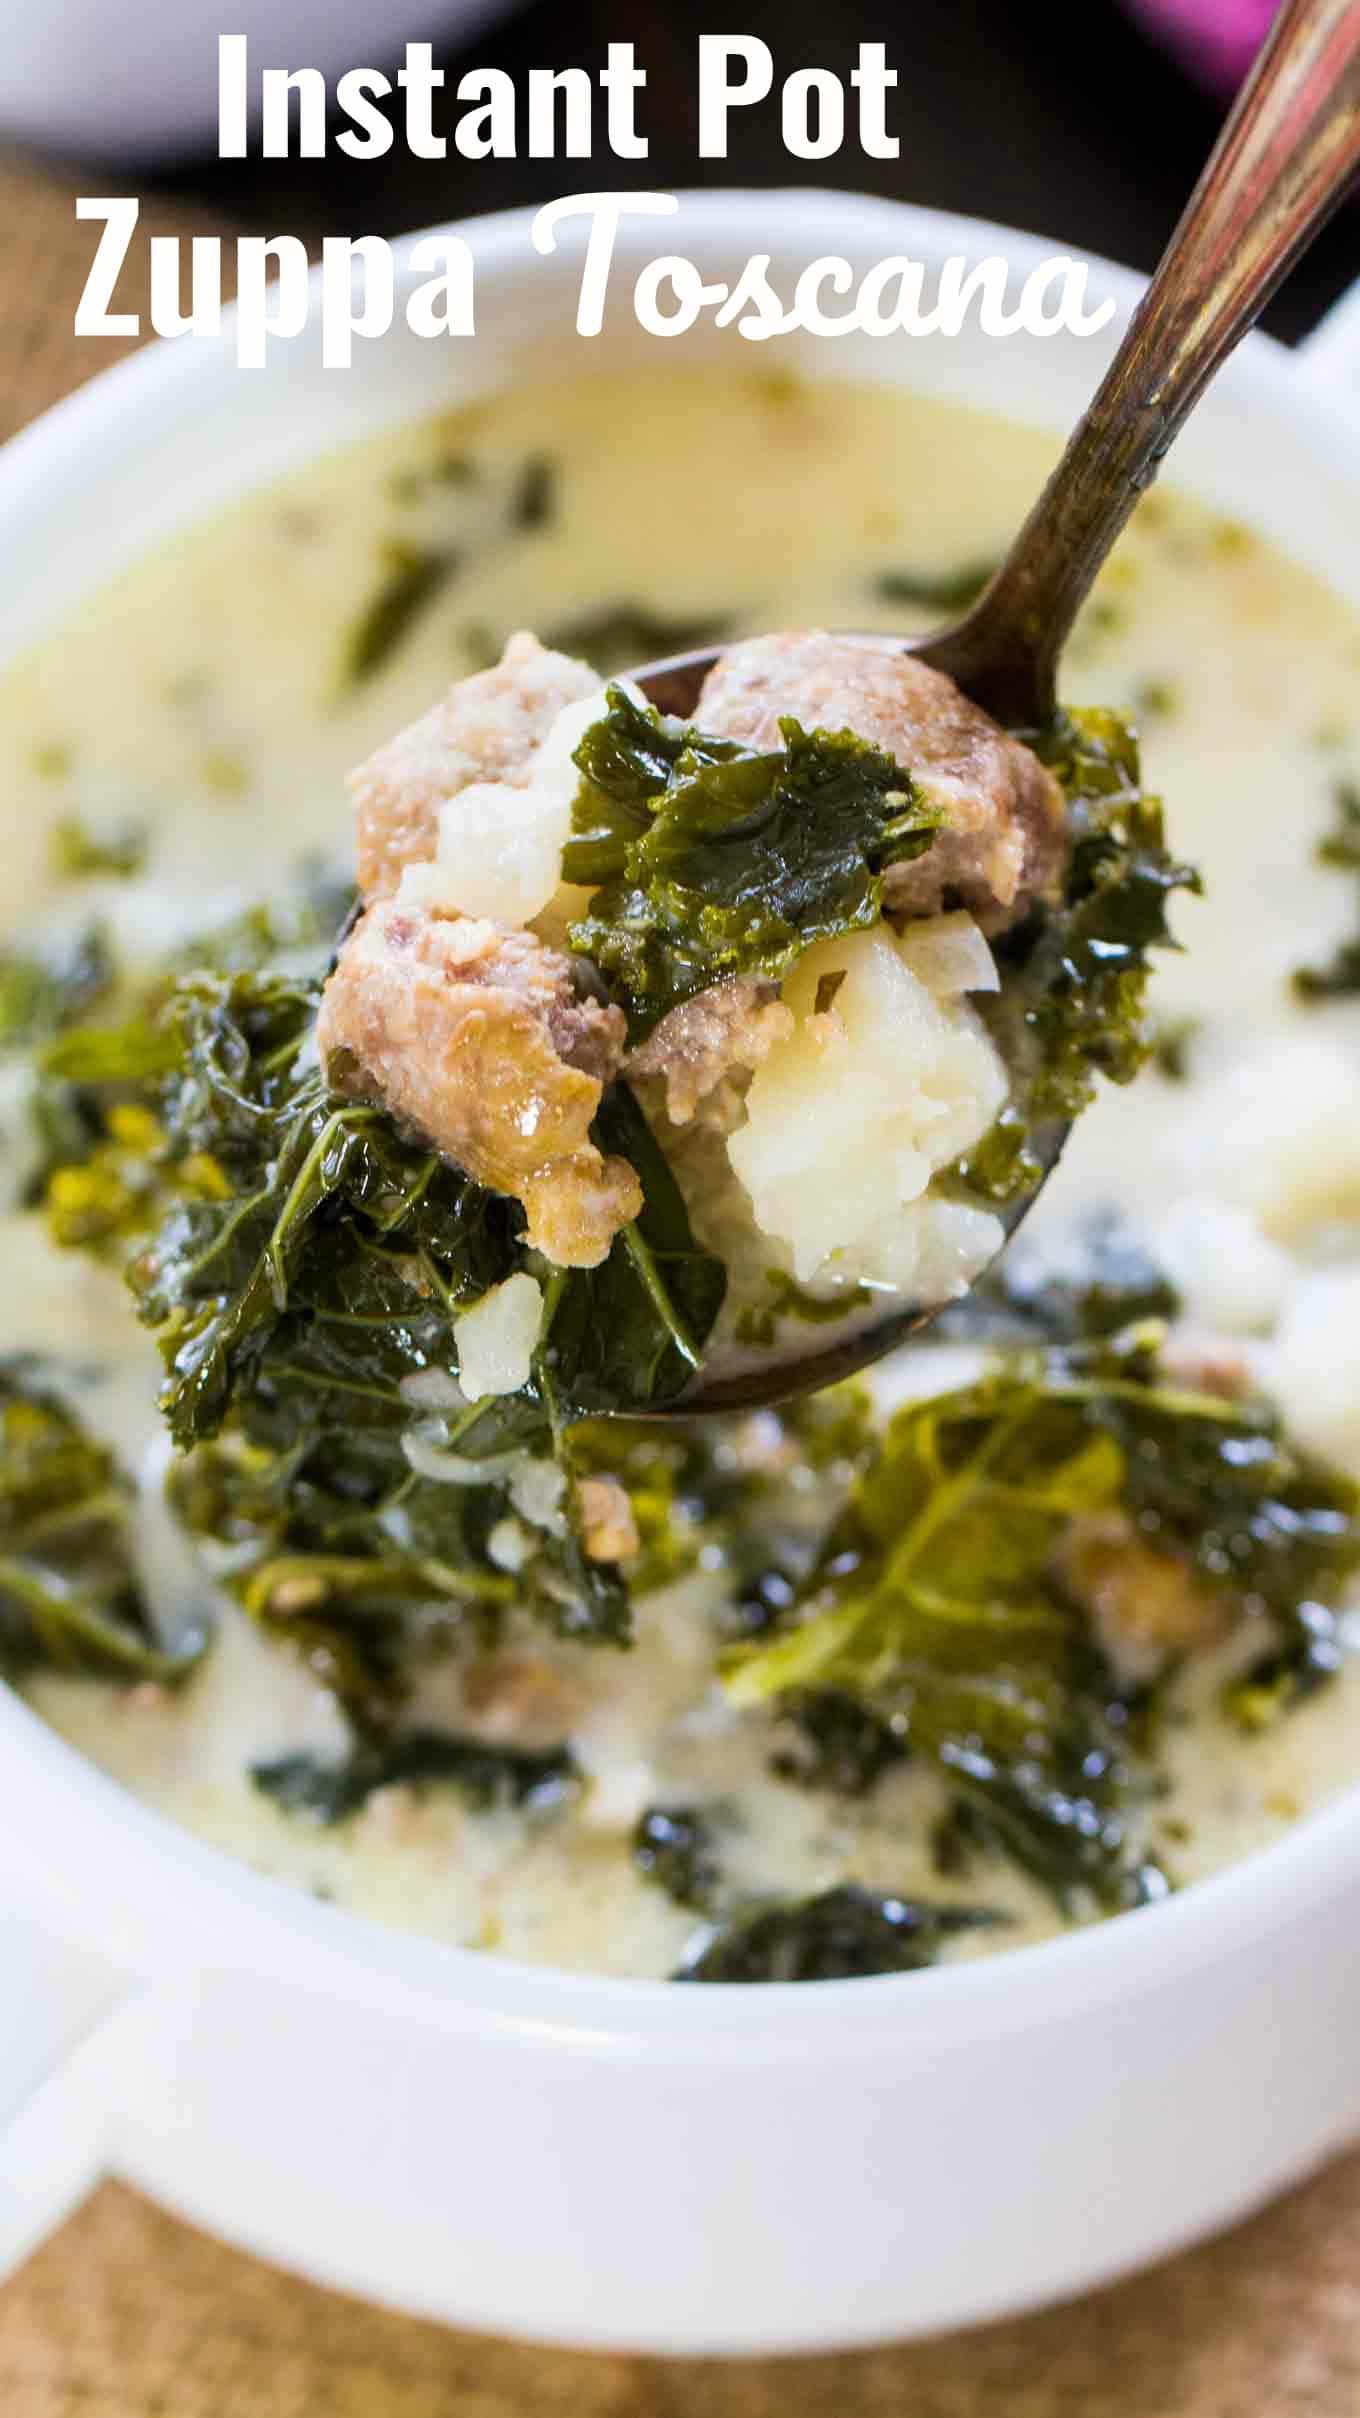 Easy Instant Pot Zuppa Toscana